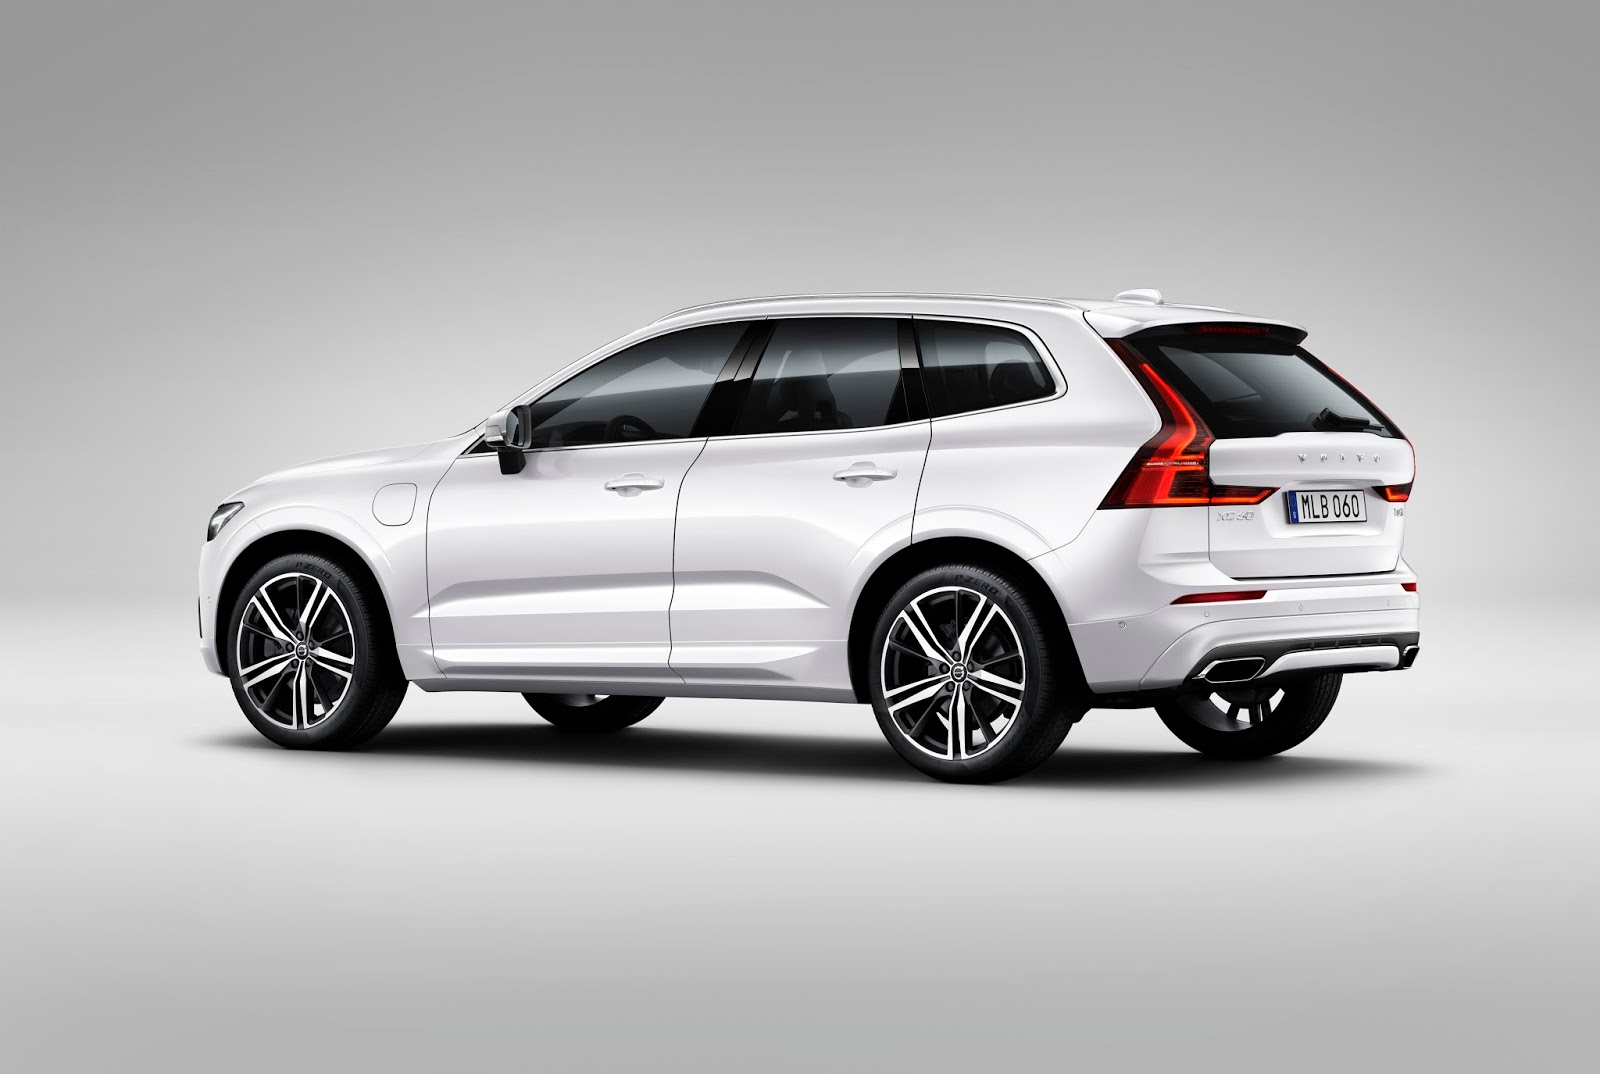 13 XC60 Crystal White T8 RDesign Είναι αυτό το ασφαλέστερο αυτοκίνητο ever; Volvo, Volvo XC60, zblog